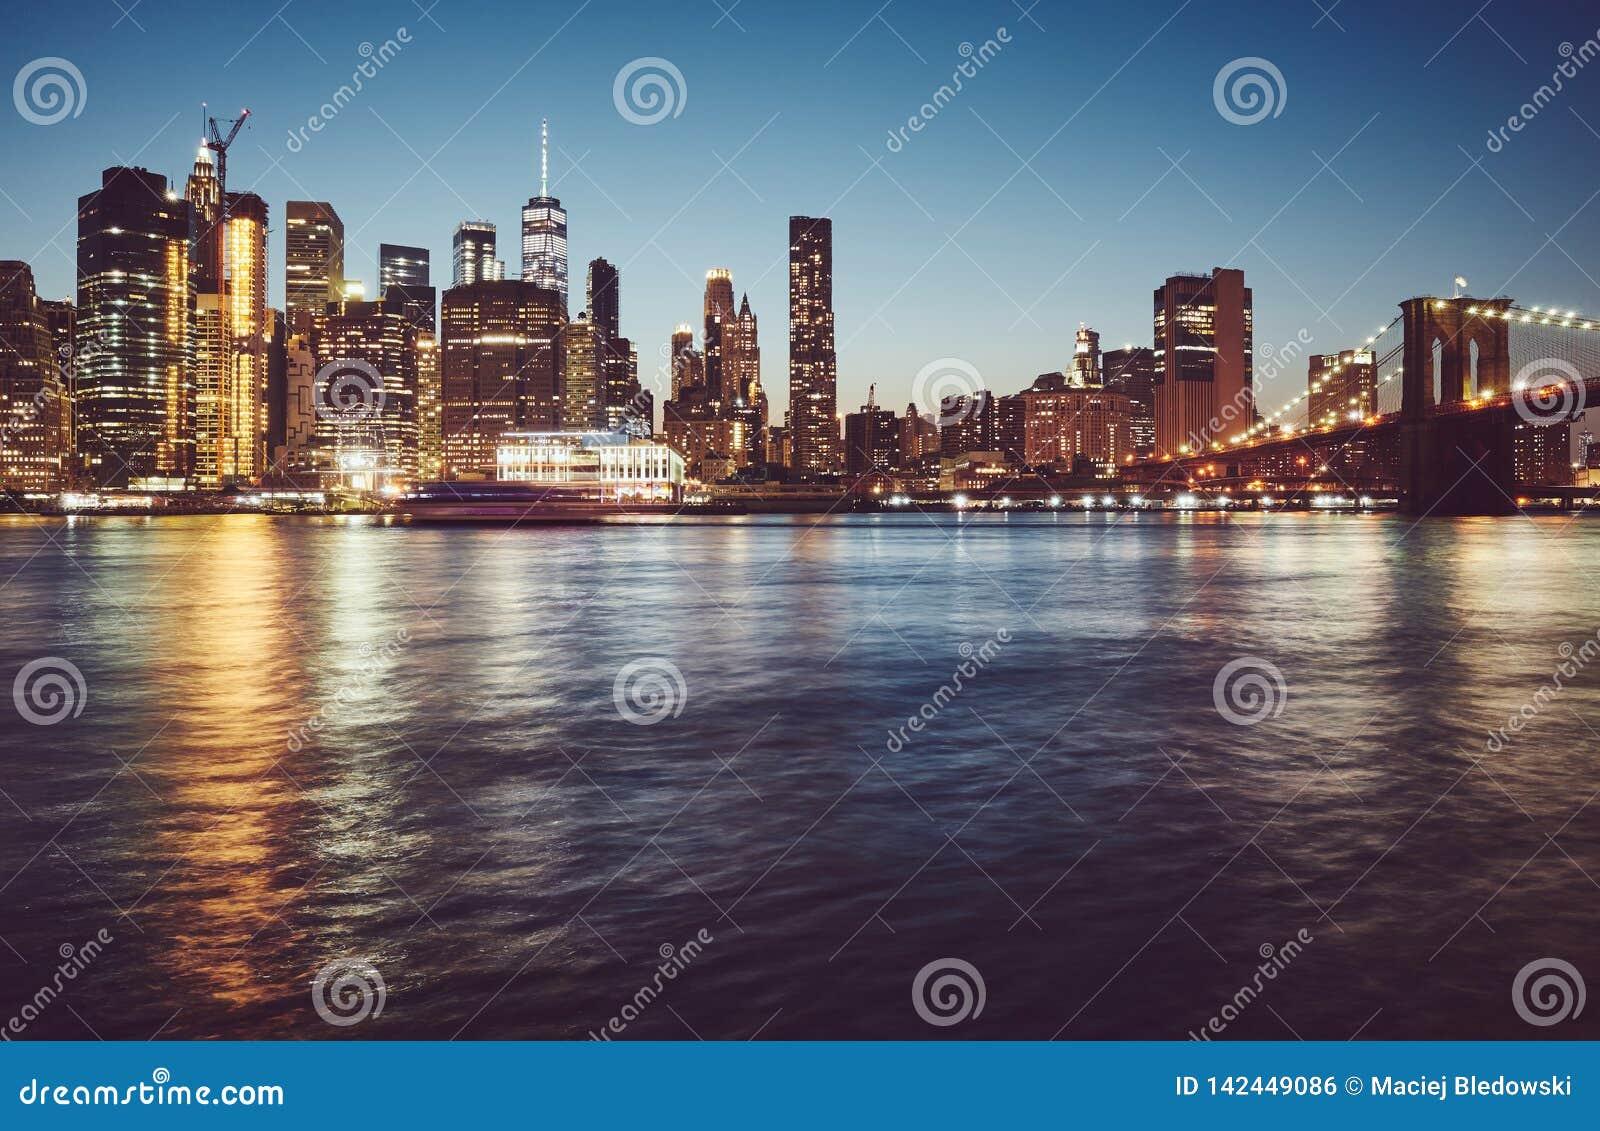 Манхэттен на голубом часе, Нью-Йорк